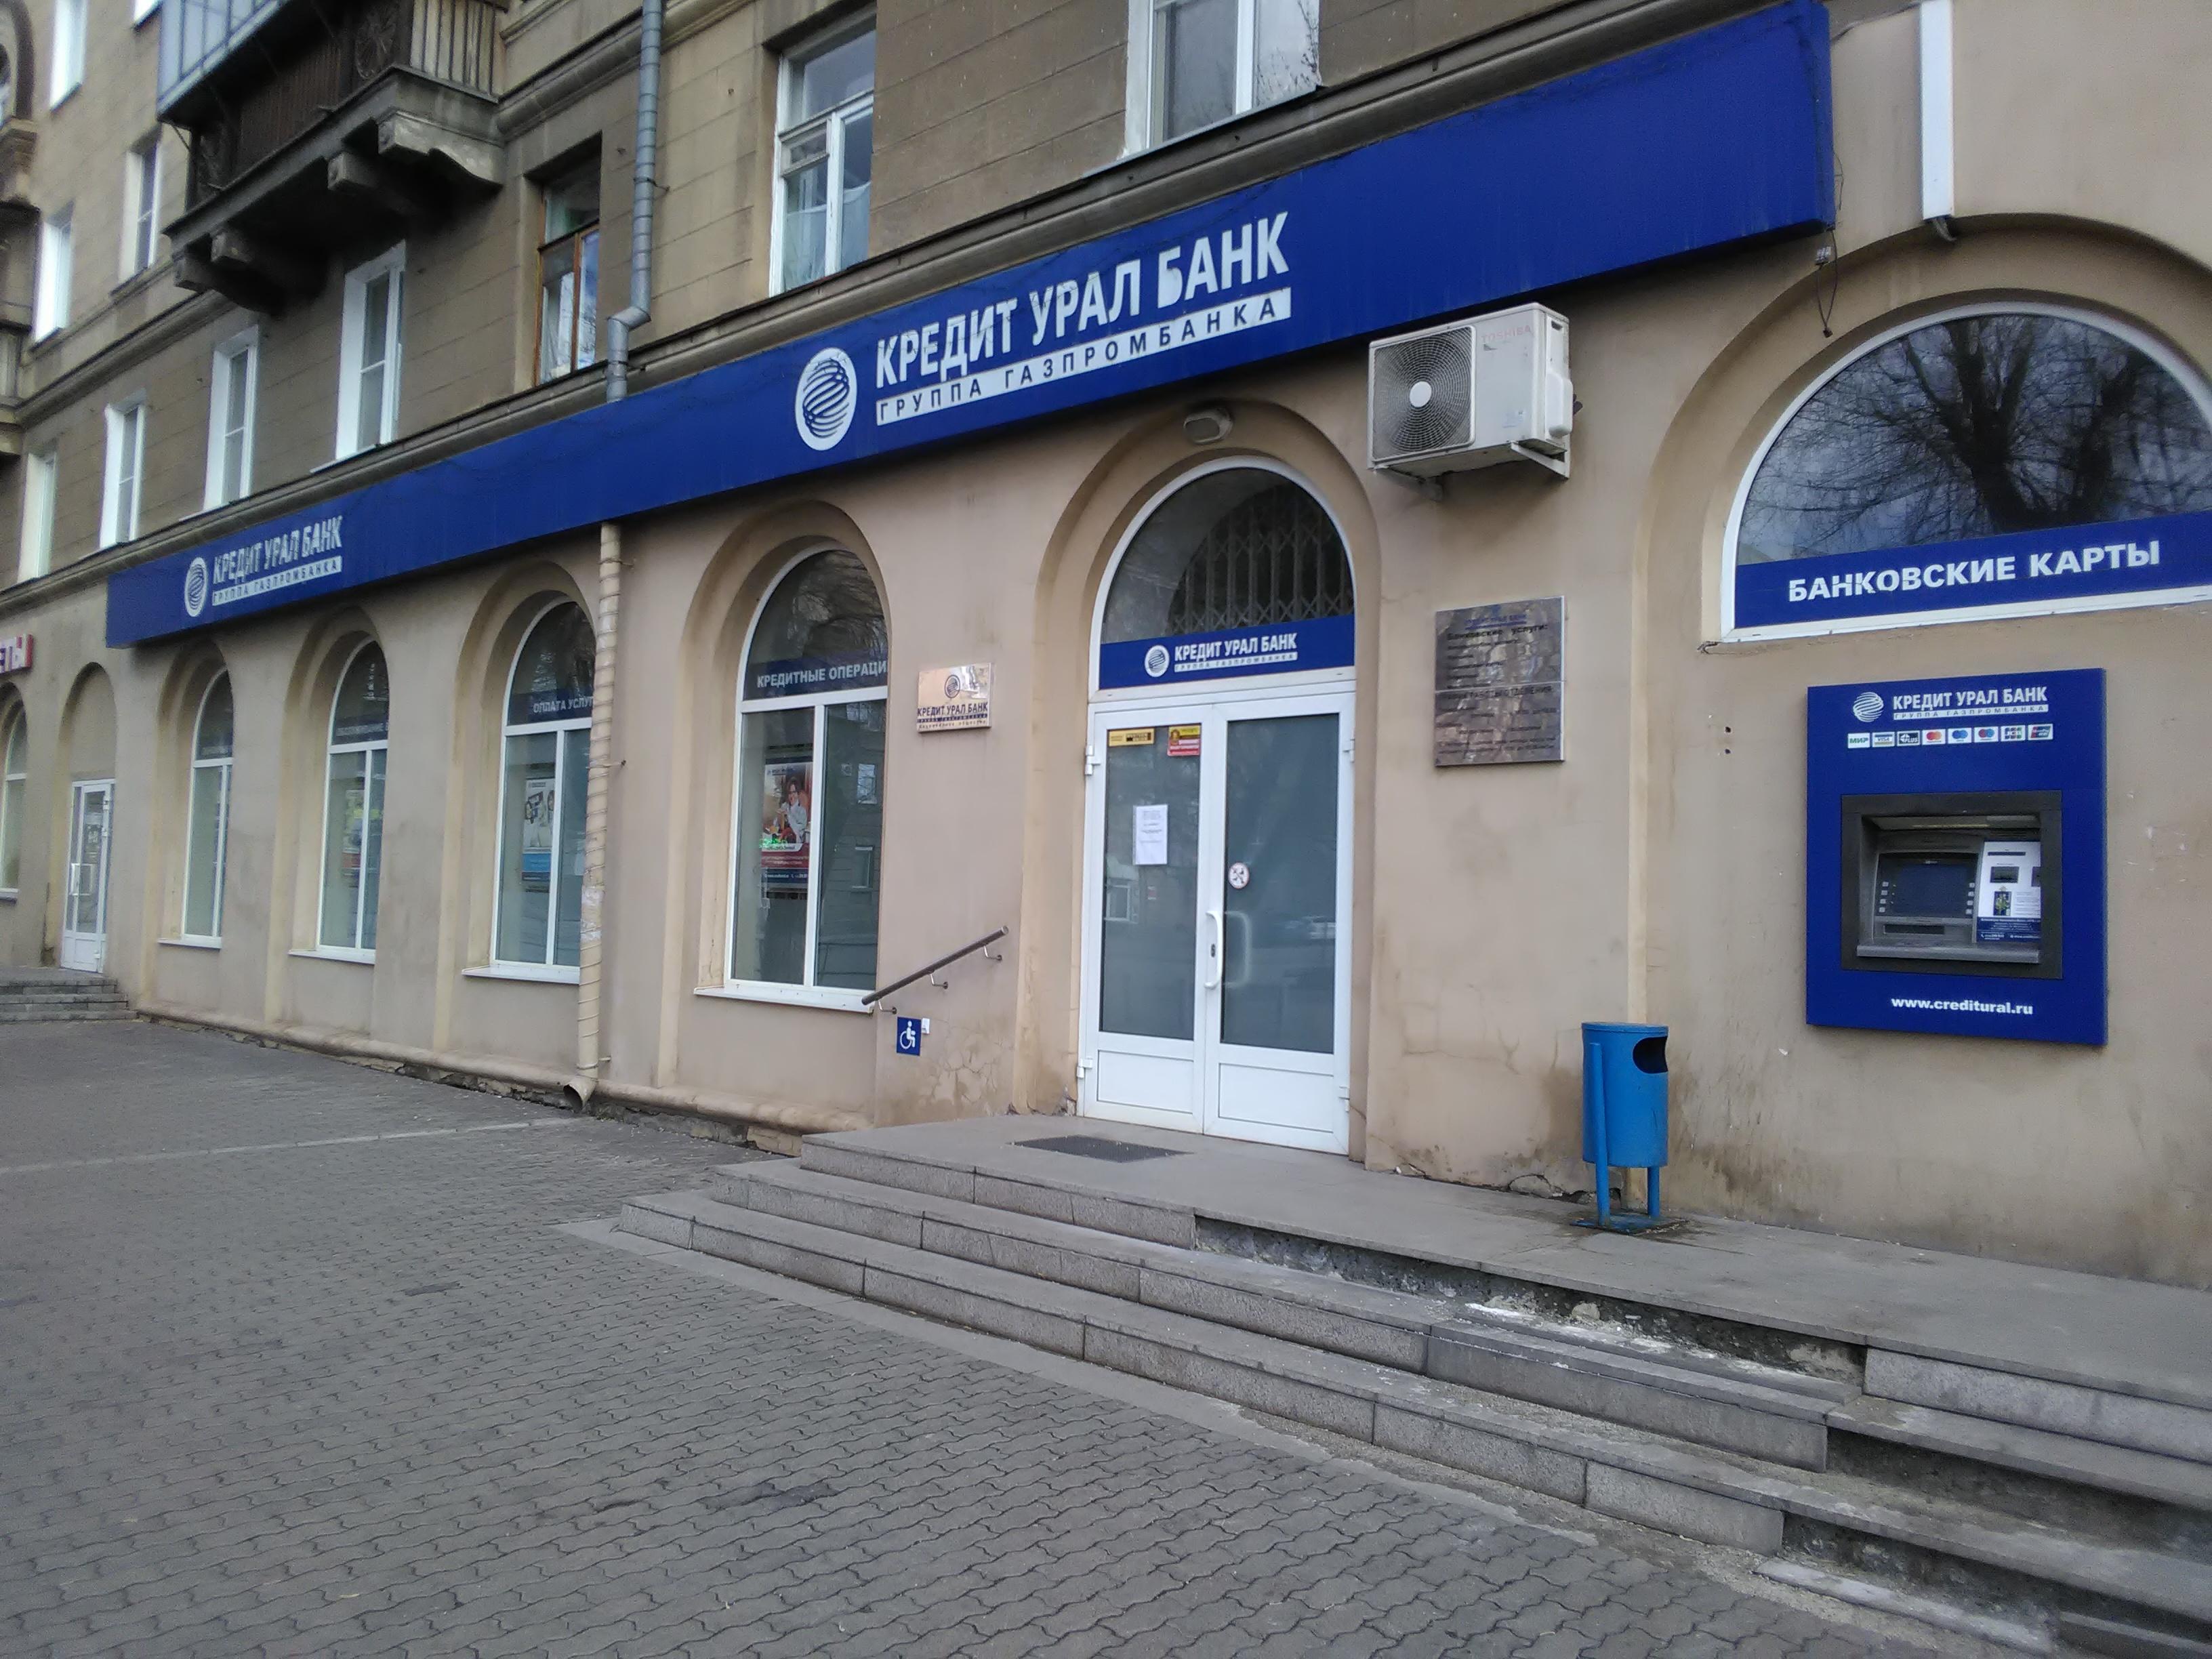 Www creditural система true cost